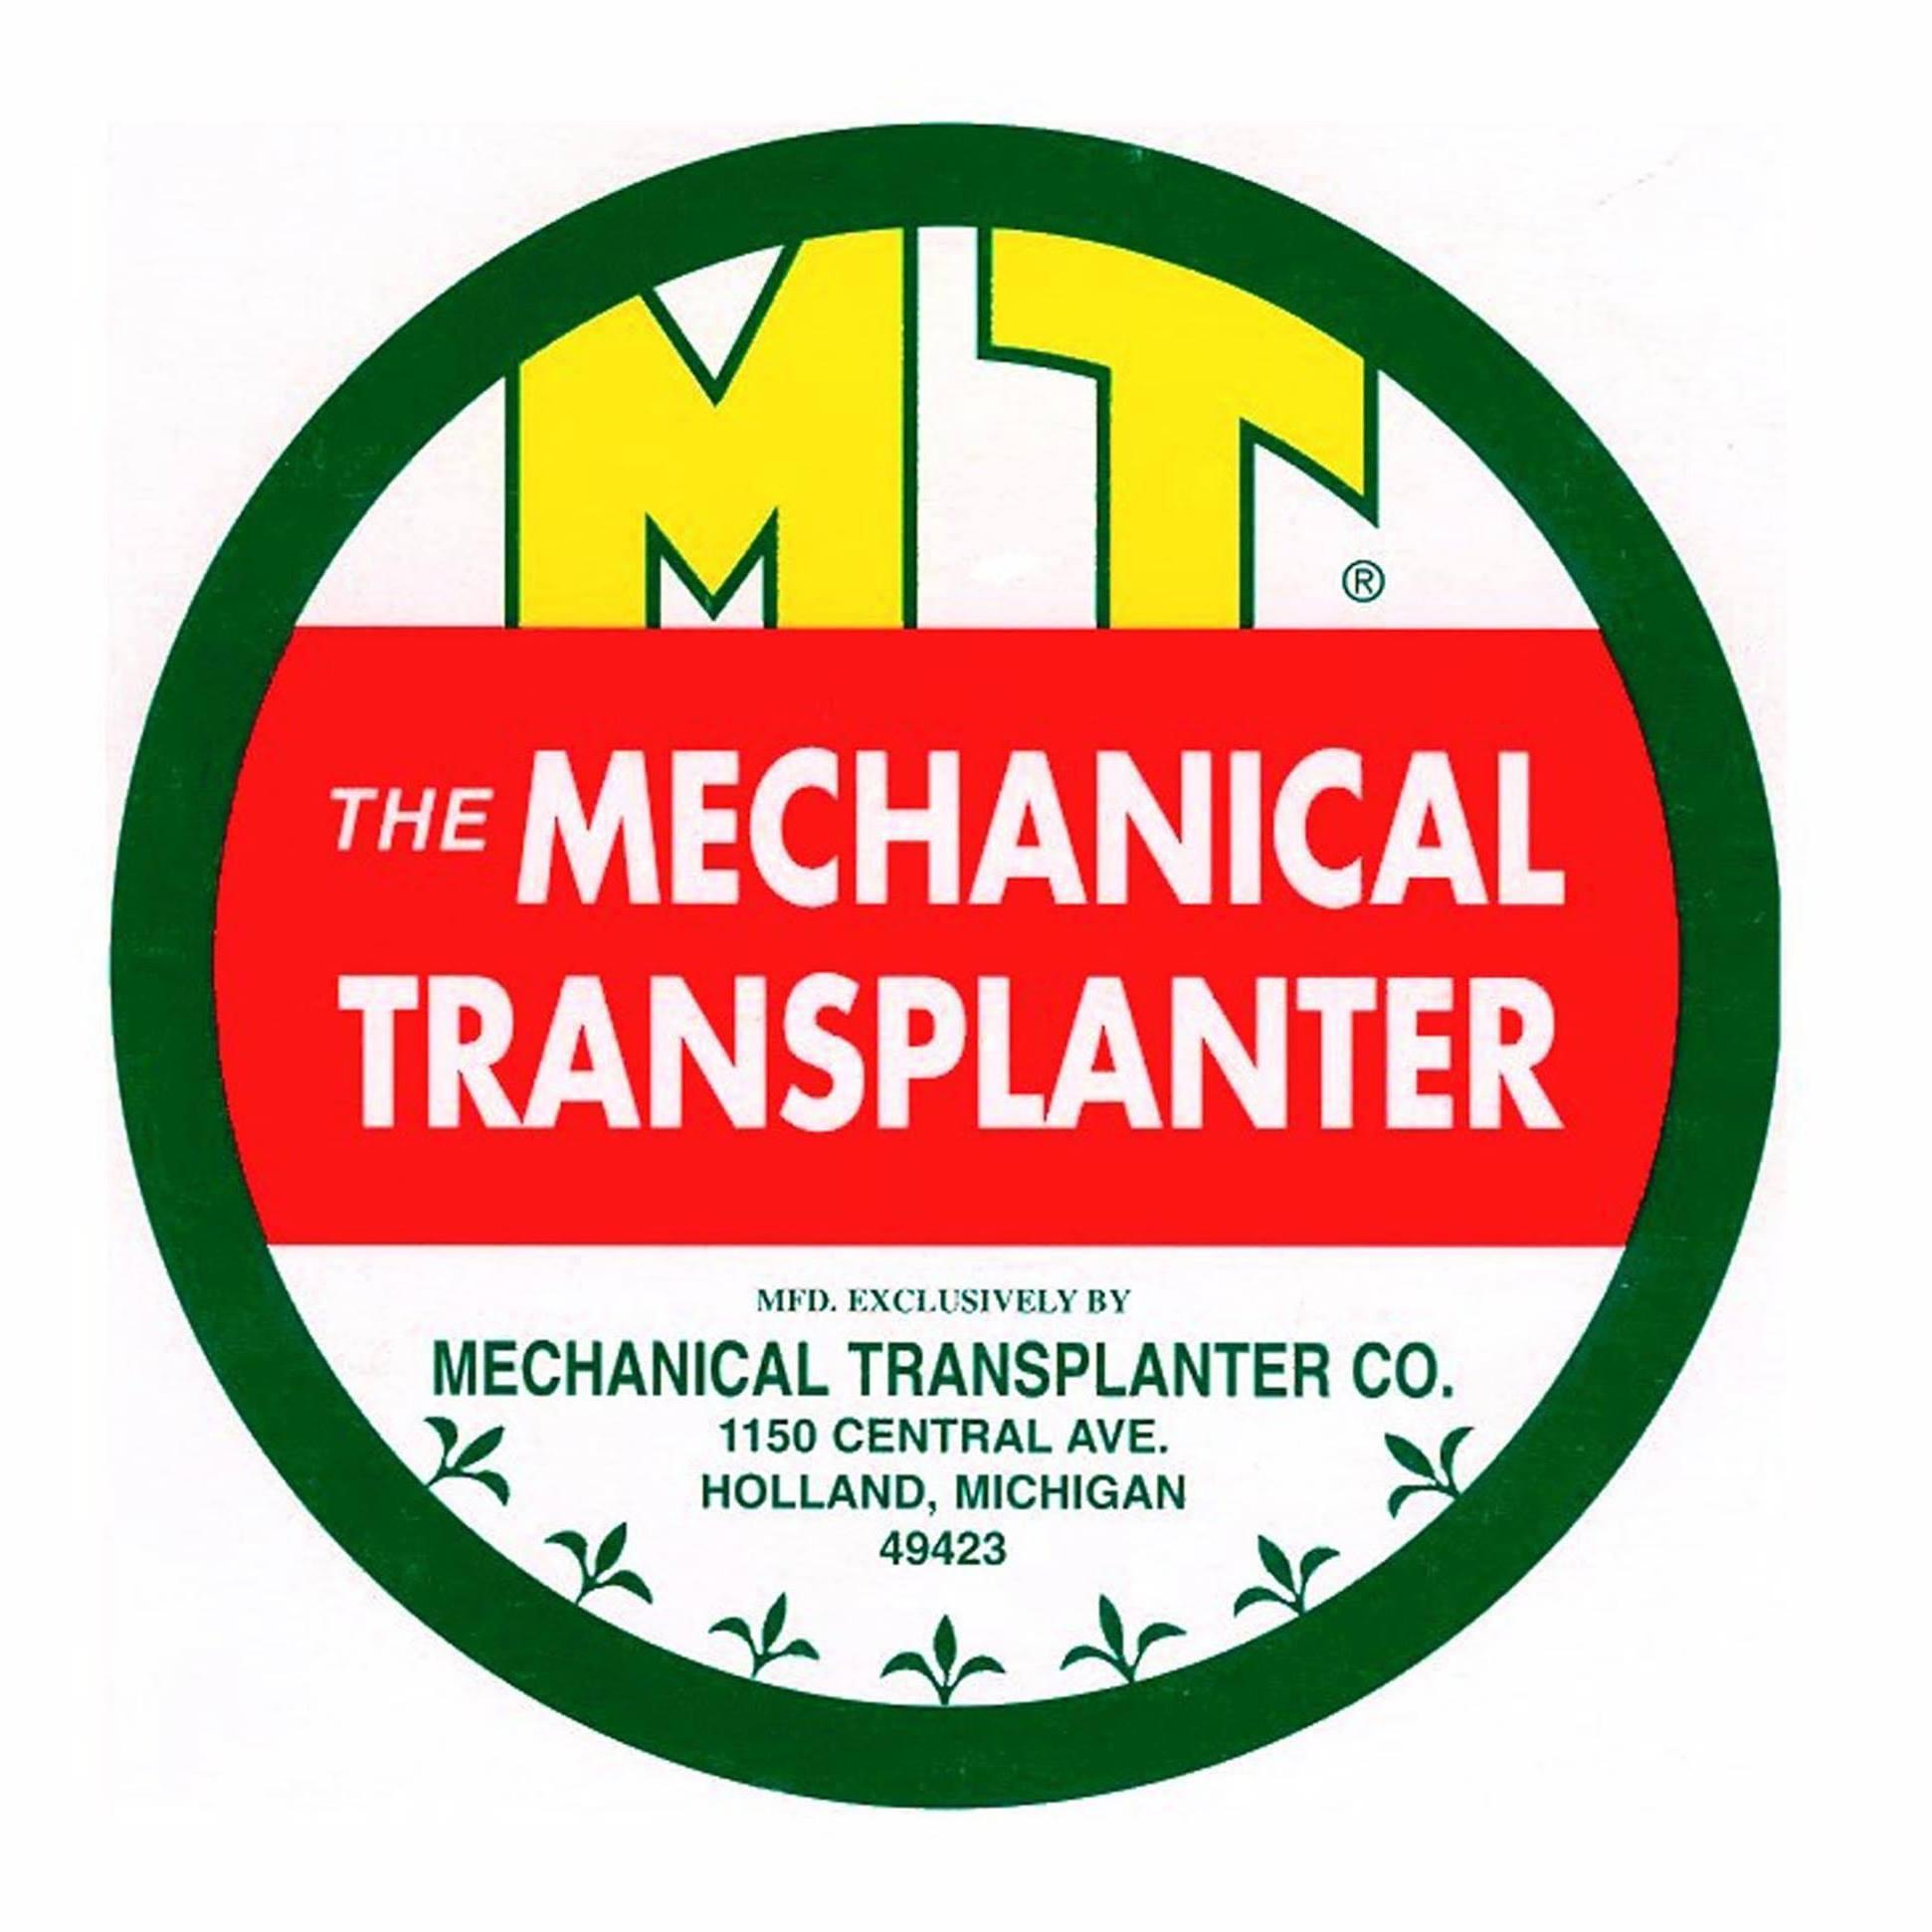 Mechanical Transplanter - Hemp Harvest Works